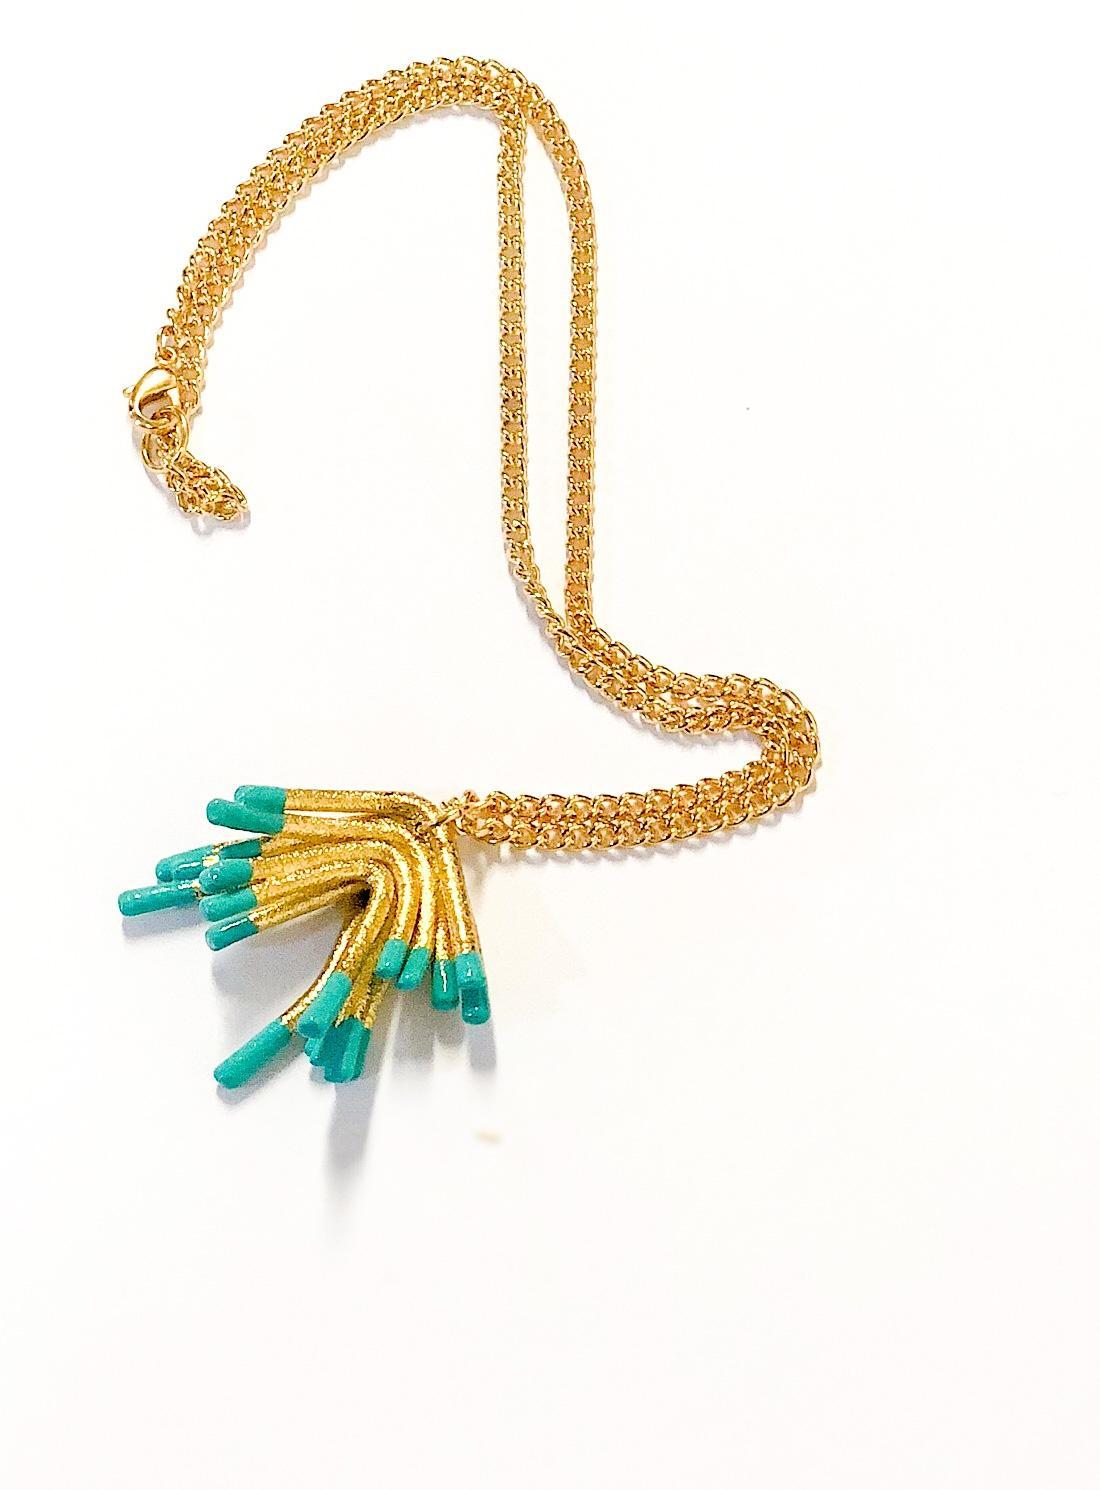 Oddical Synthetic Sylvie Mini Pendant Necklace in Gold (Metallic)